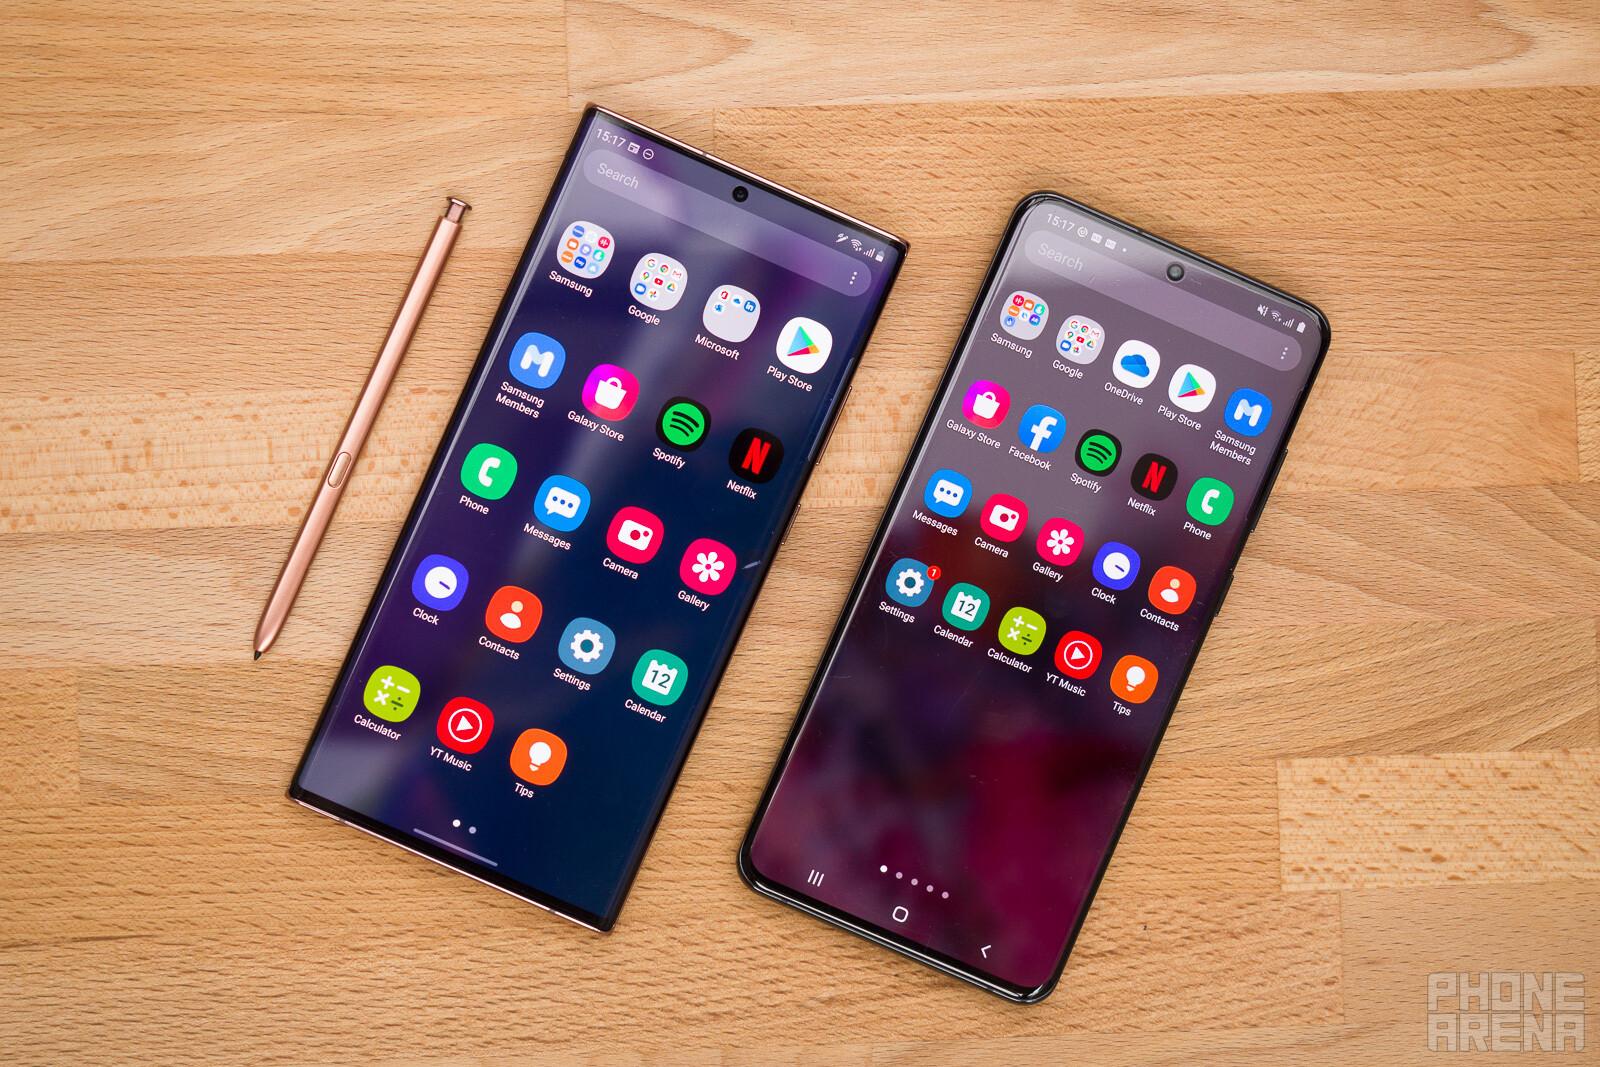 Samsung-Galaxy-Note-20-Ultra-vs-Galaxy-S20-Ultra008.jpg